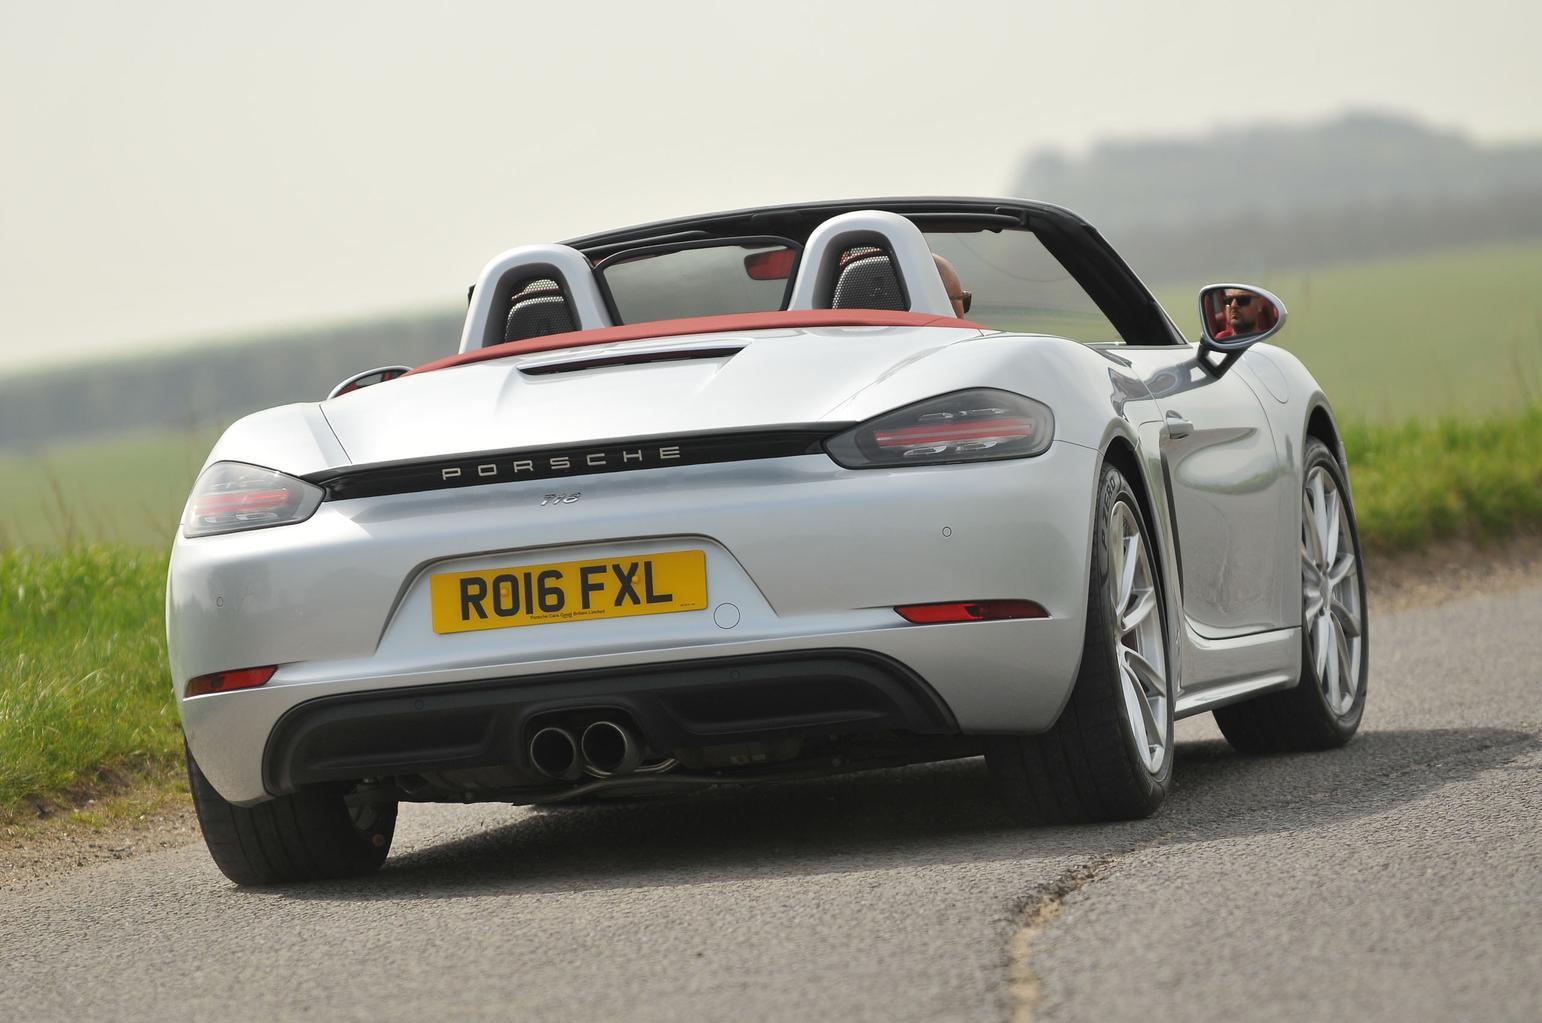 Porsche 718 Boxster S vs Audi TTS Roadster